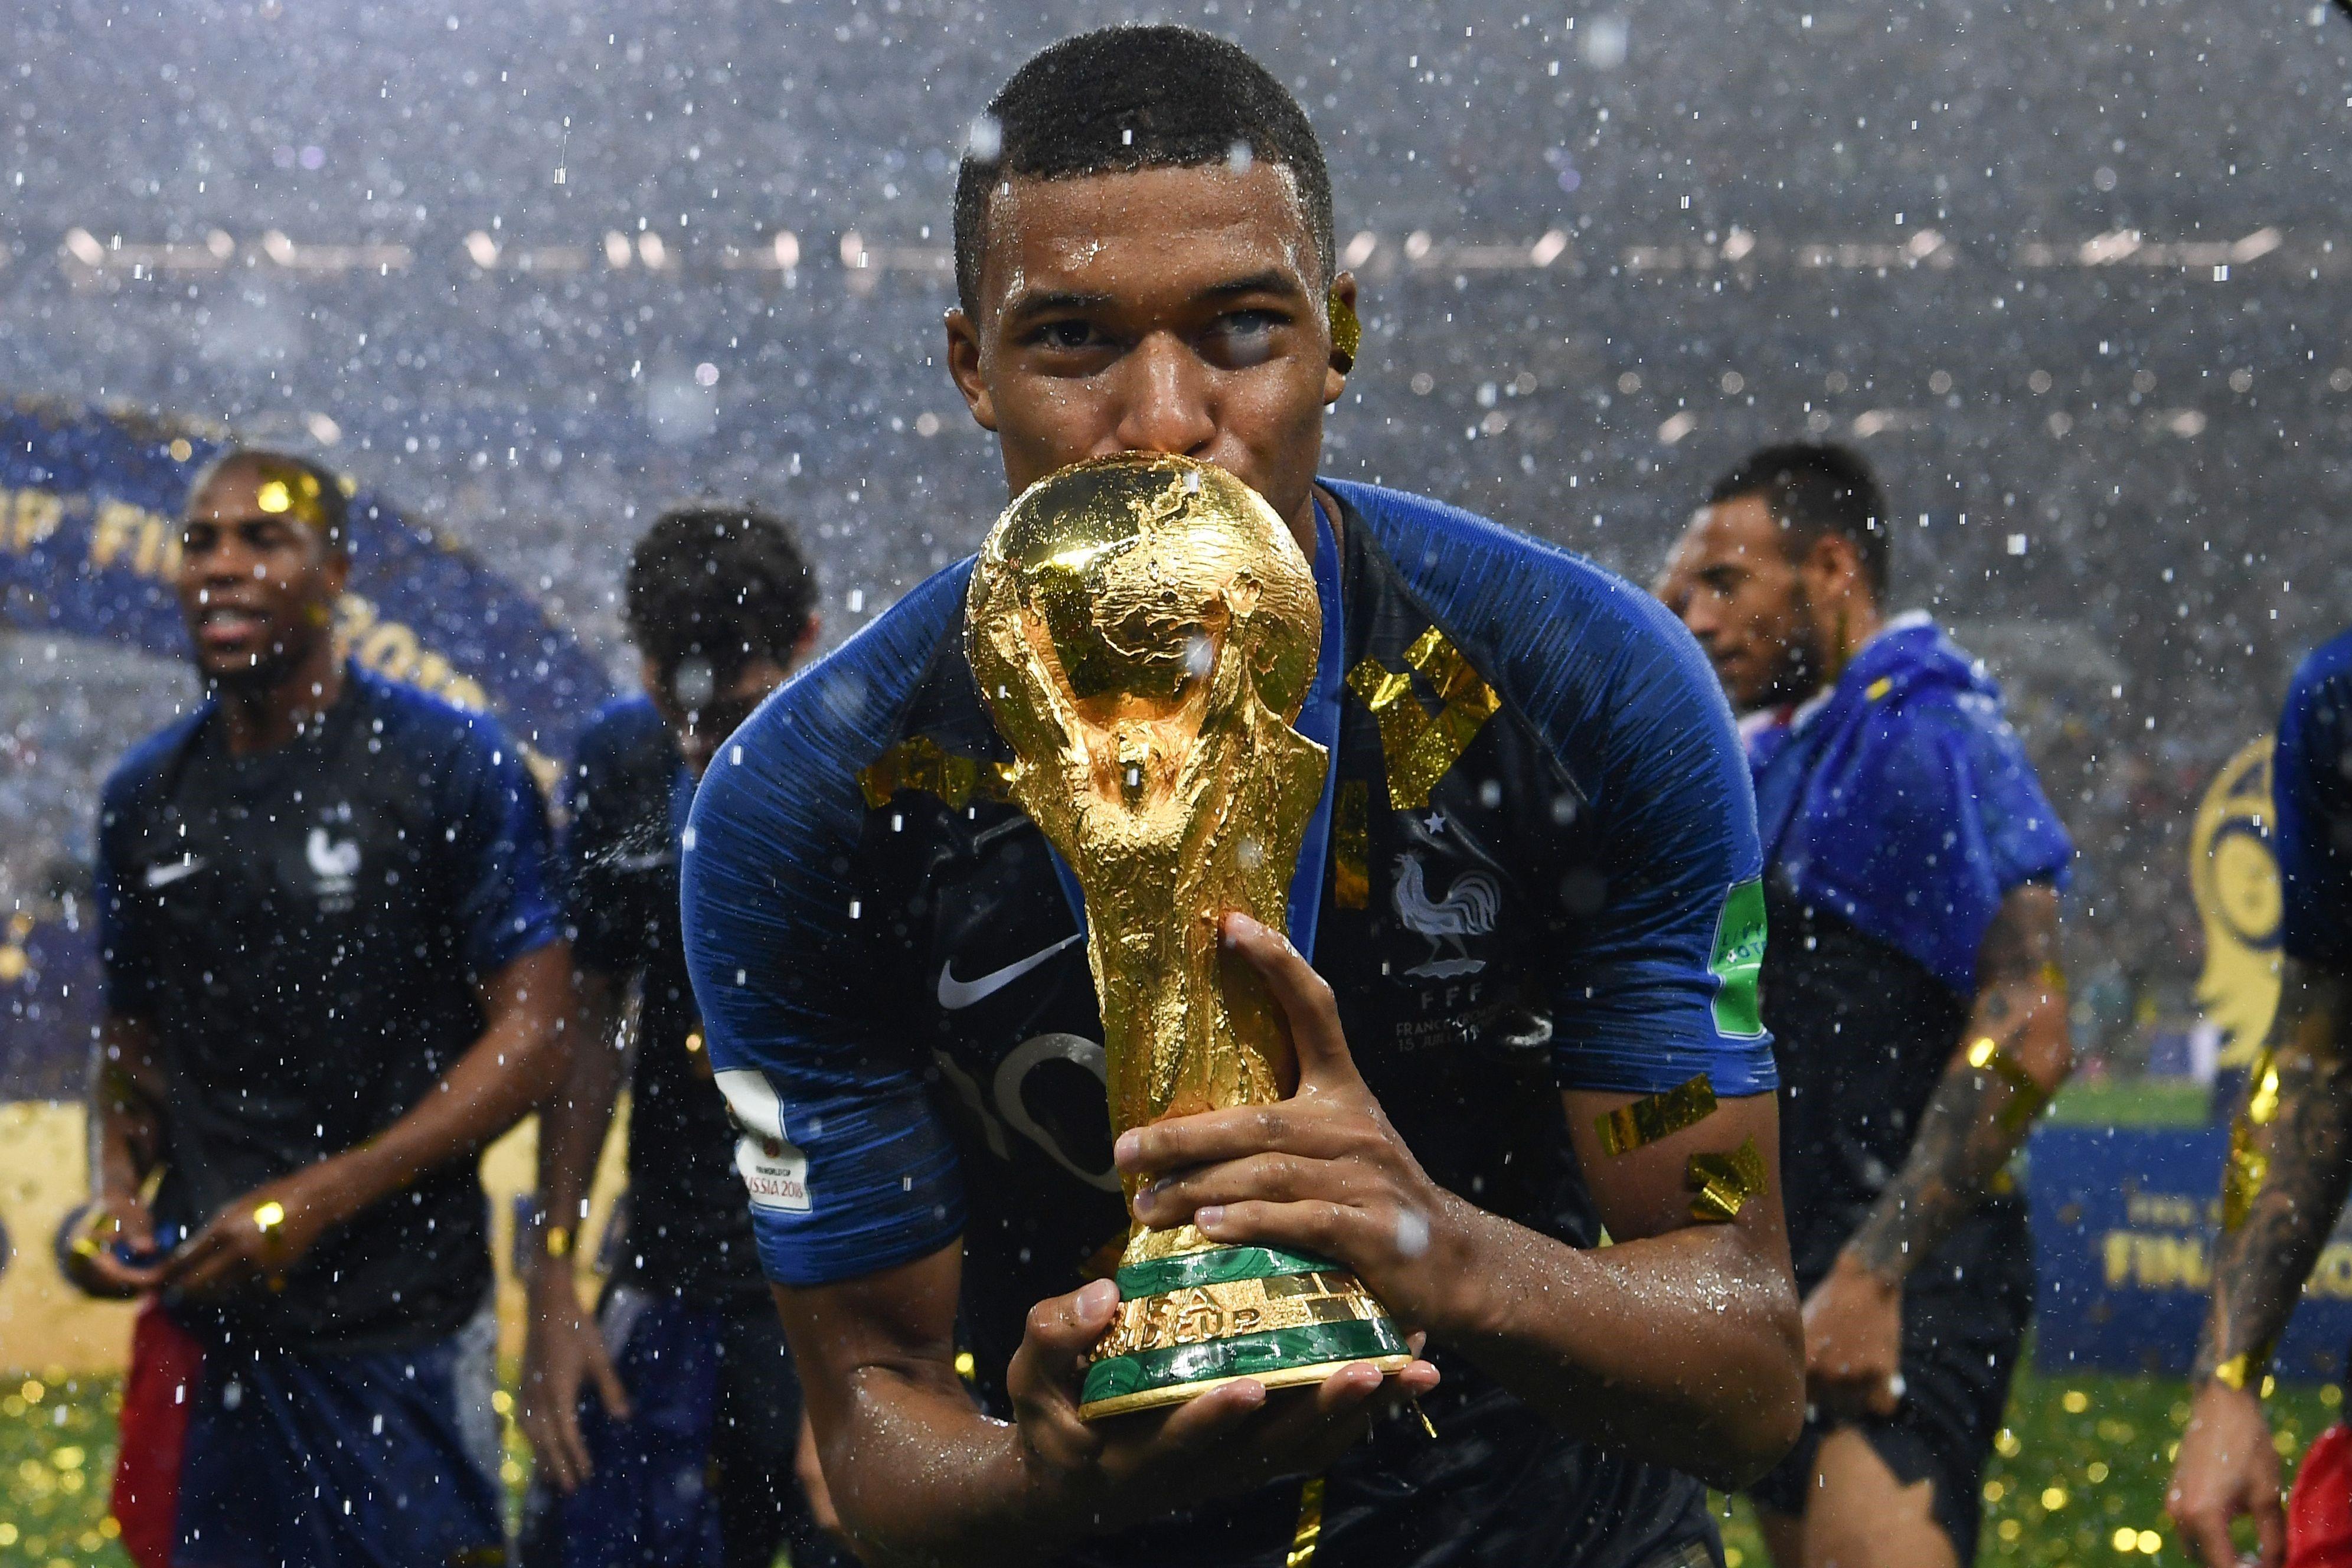 Kylian Mbappe embrasse la Coupe du monde de football - 15 juillet 2018